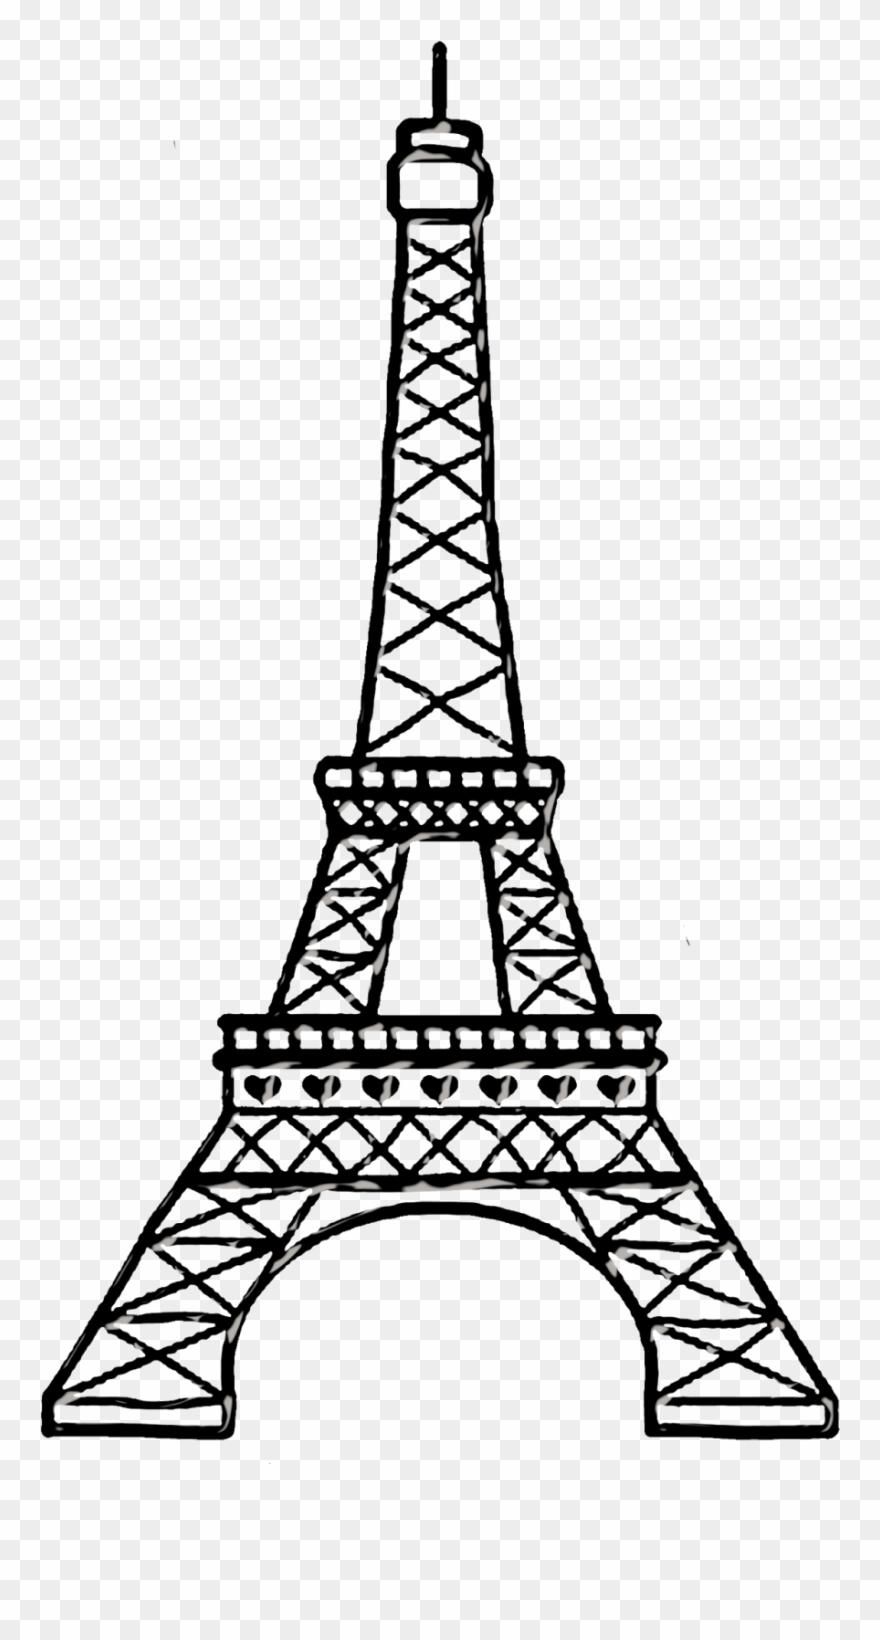 Bello Clipart Torre Eiffel Para Dibujar Png Download 105879 Pinclipart